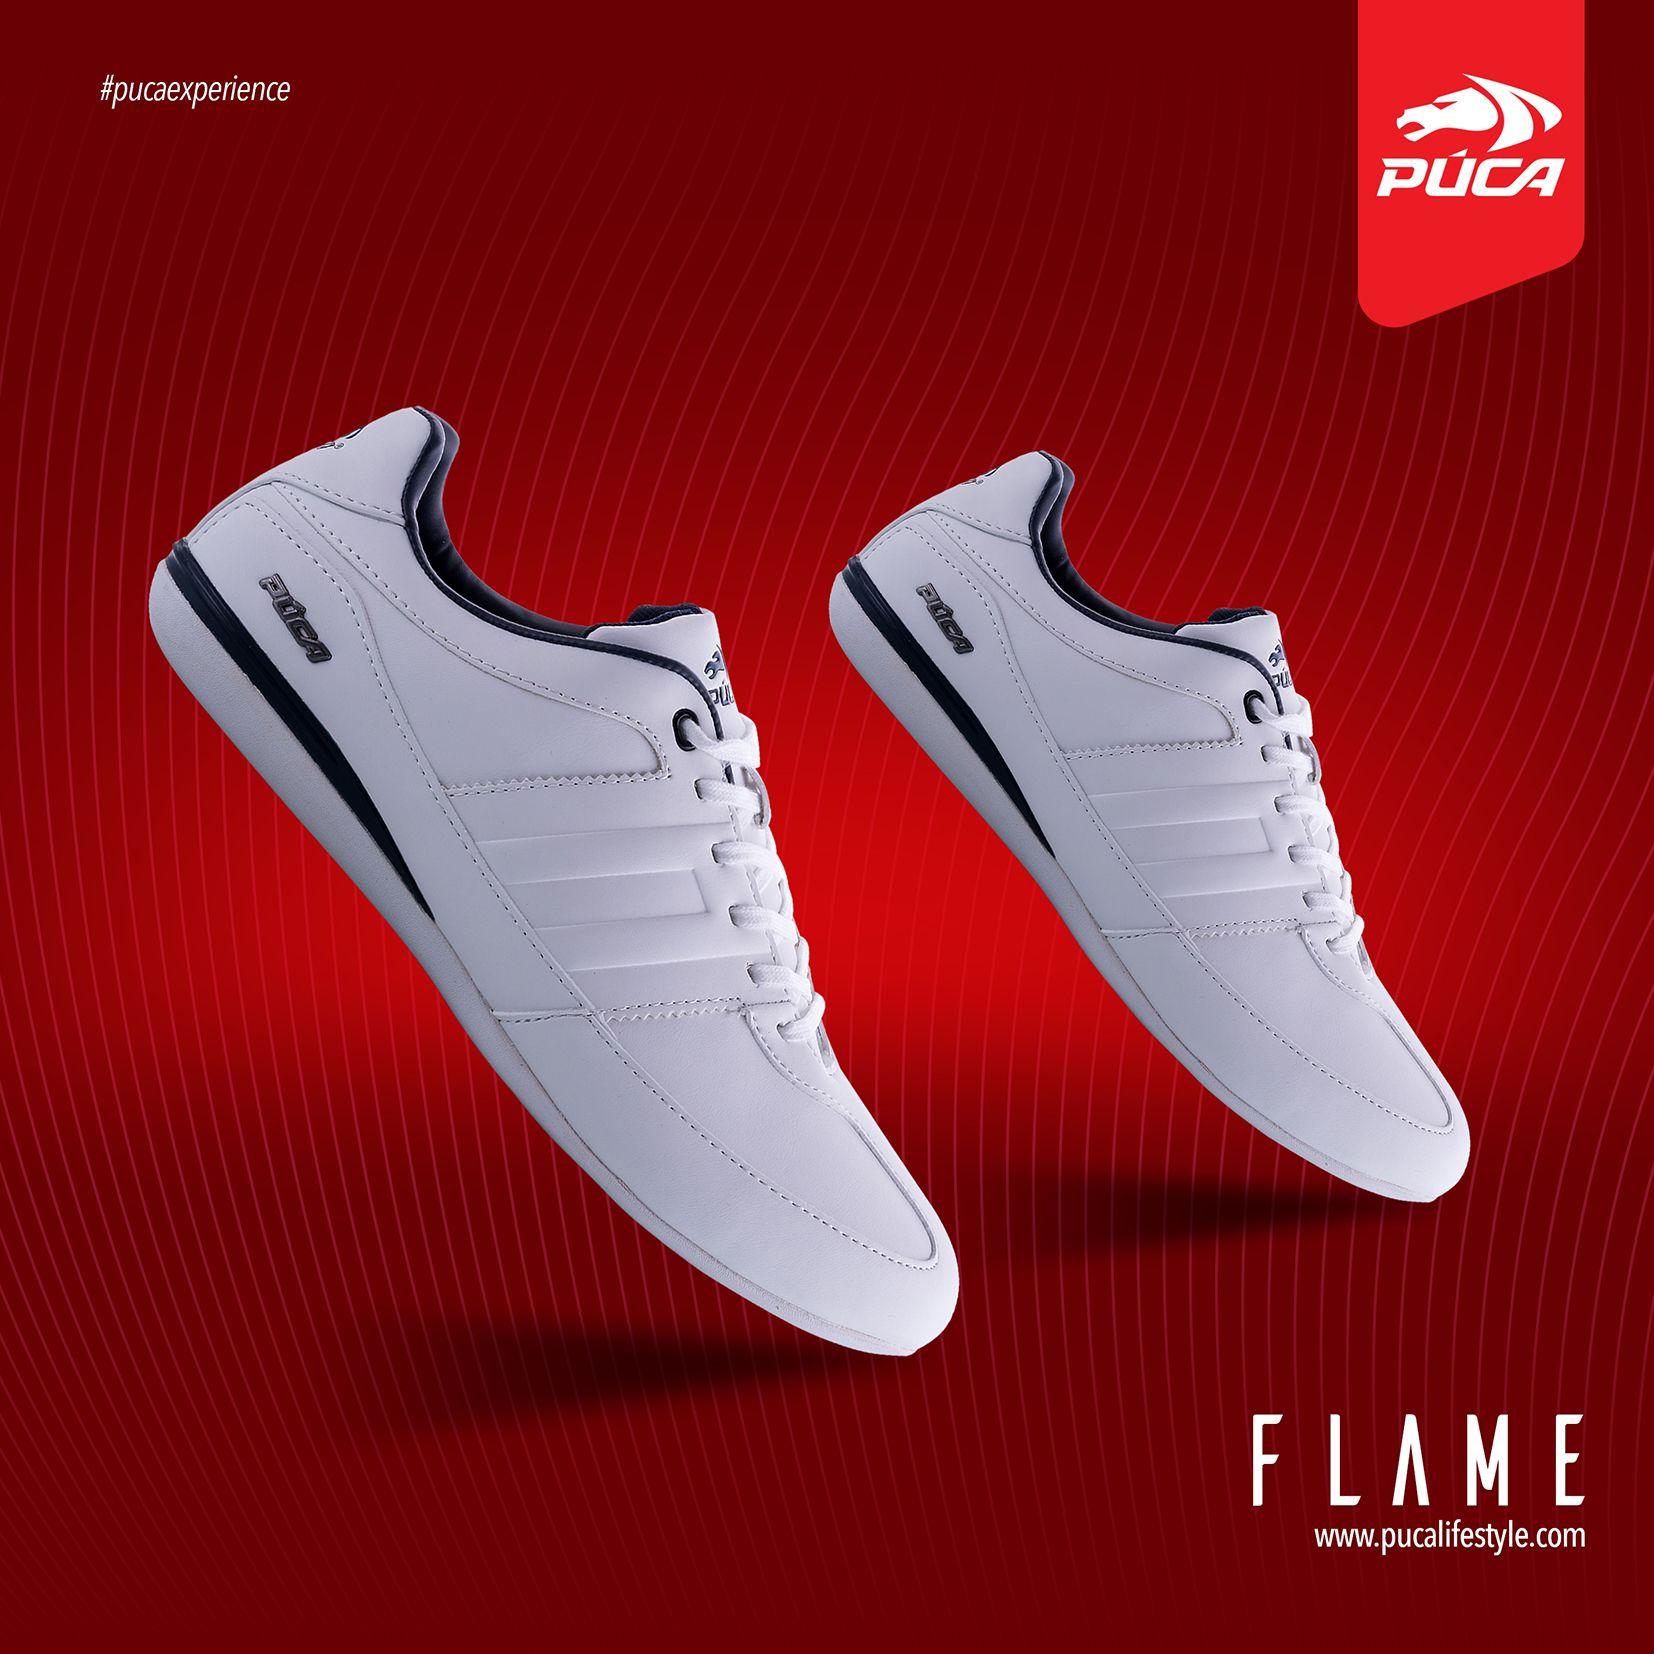 No1 UAE sport shoe brand PICK SHARE